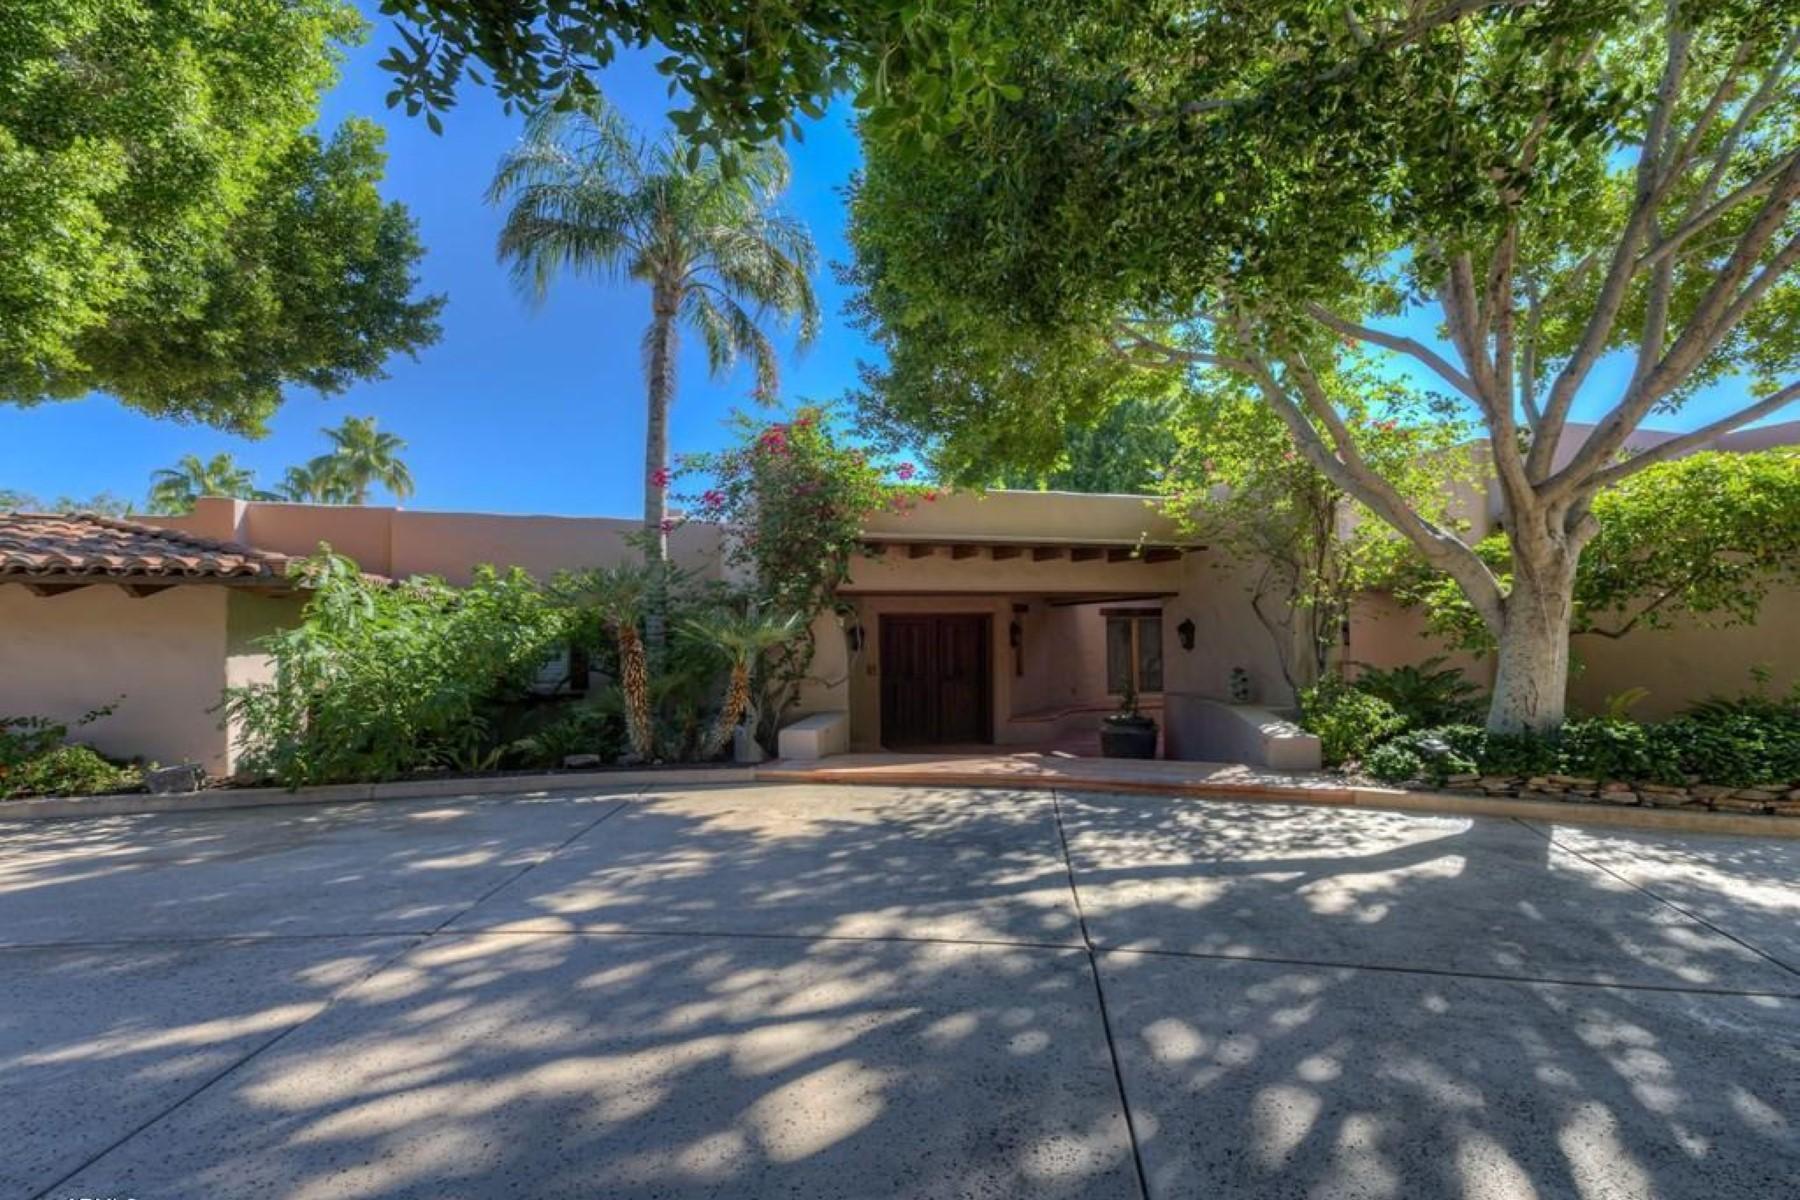 Casa para uma família para Venda às One Of The Most Authentically Special Homes In The Valley 3988 E Paradise View Drive Paradise Valley, Arizona 85253 Estados Unidos